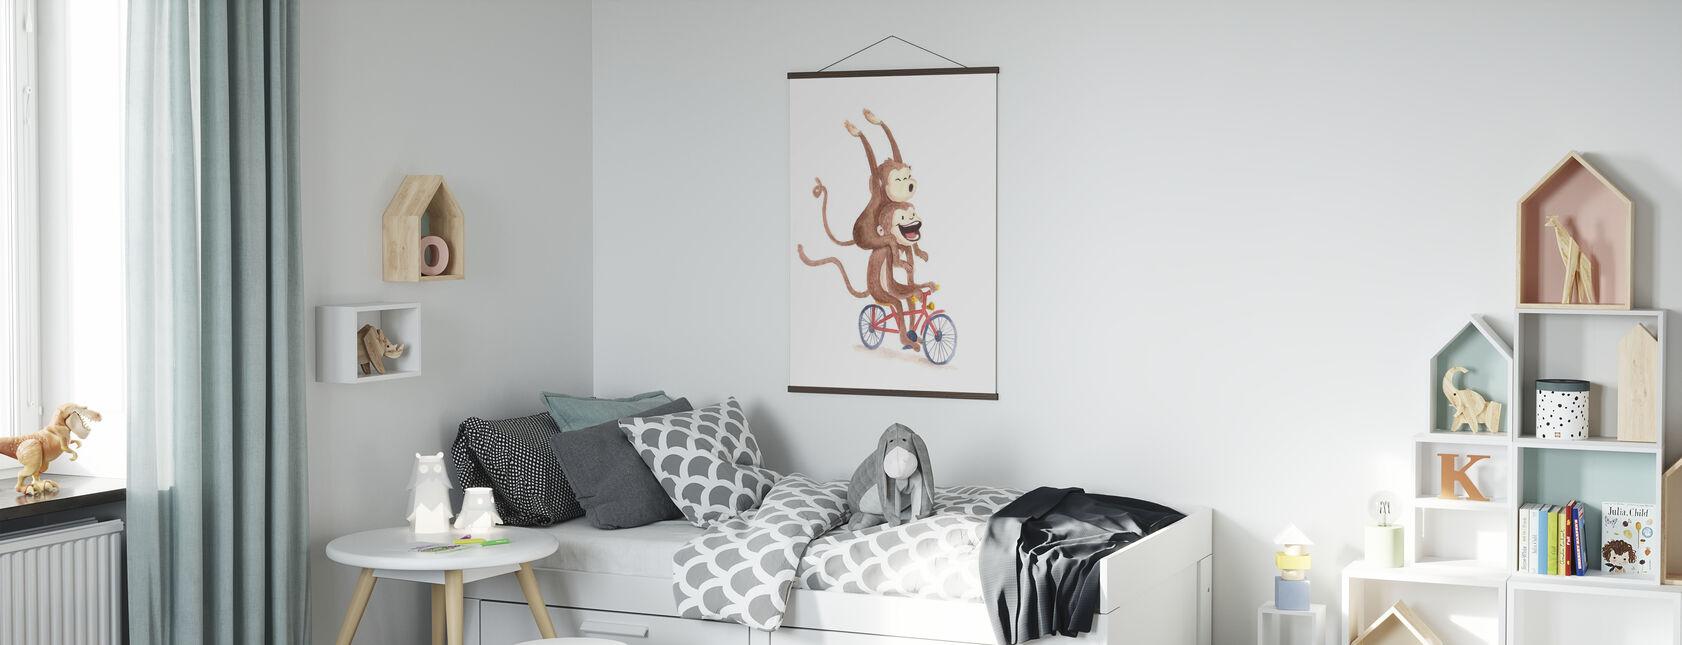 Tiere Freunde - Poster - Kinderzimmer